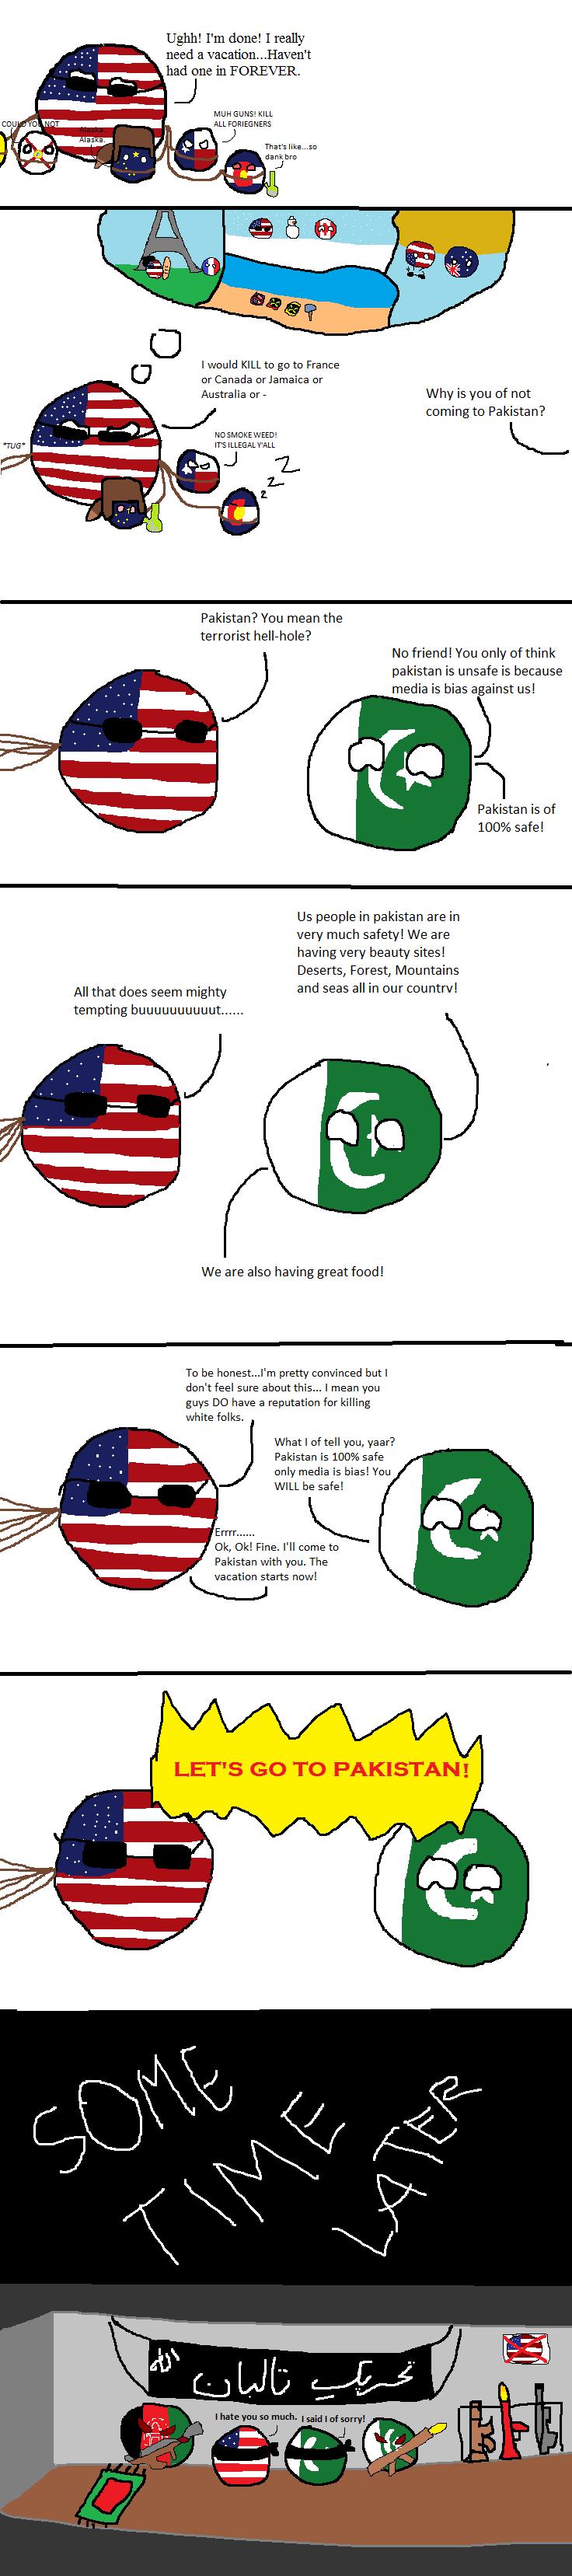 America's Great Pakistani Vacation!